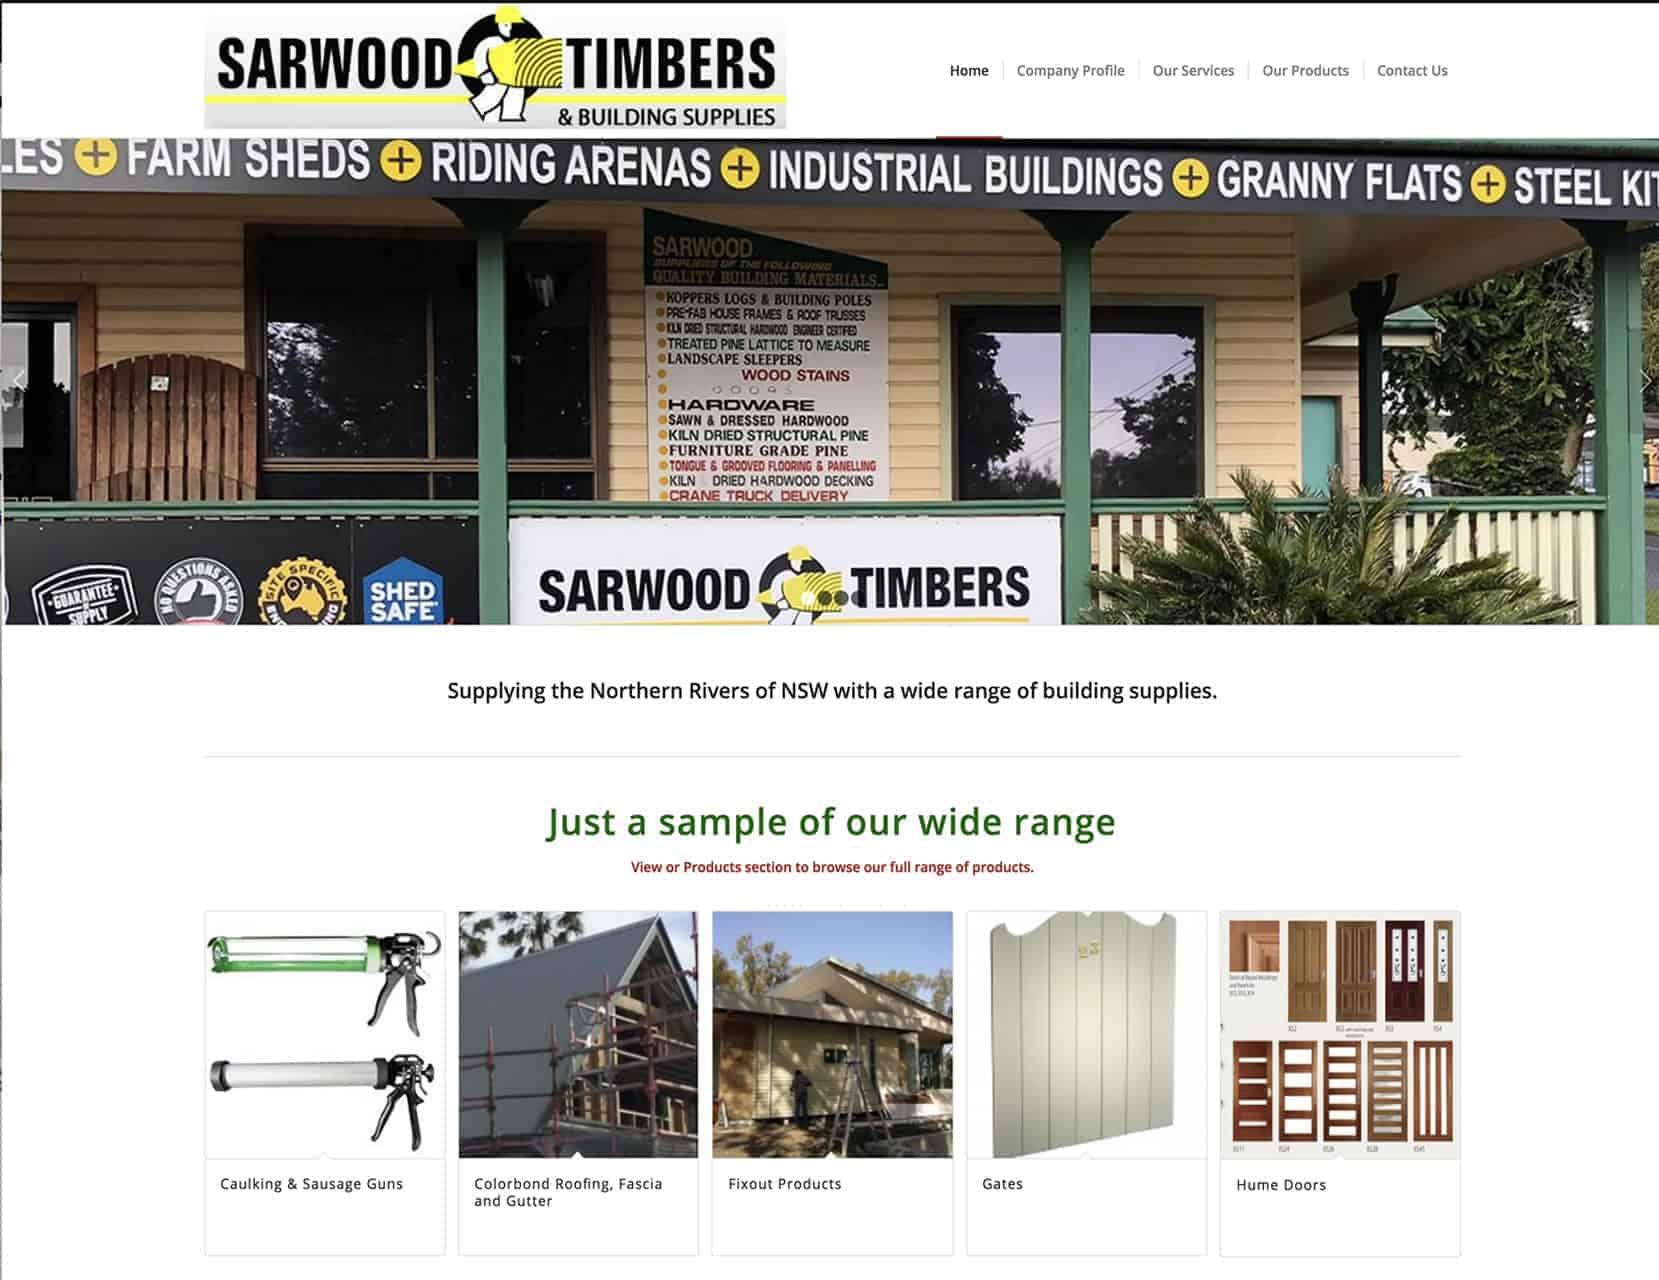 Sarwood